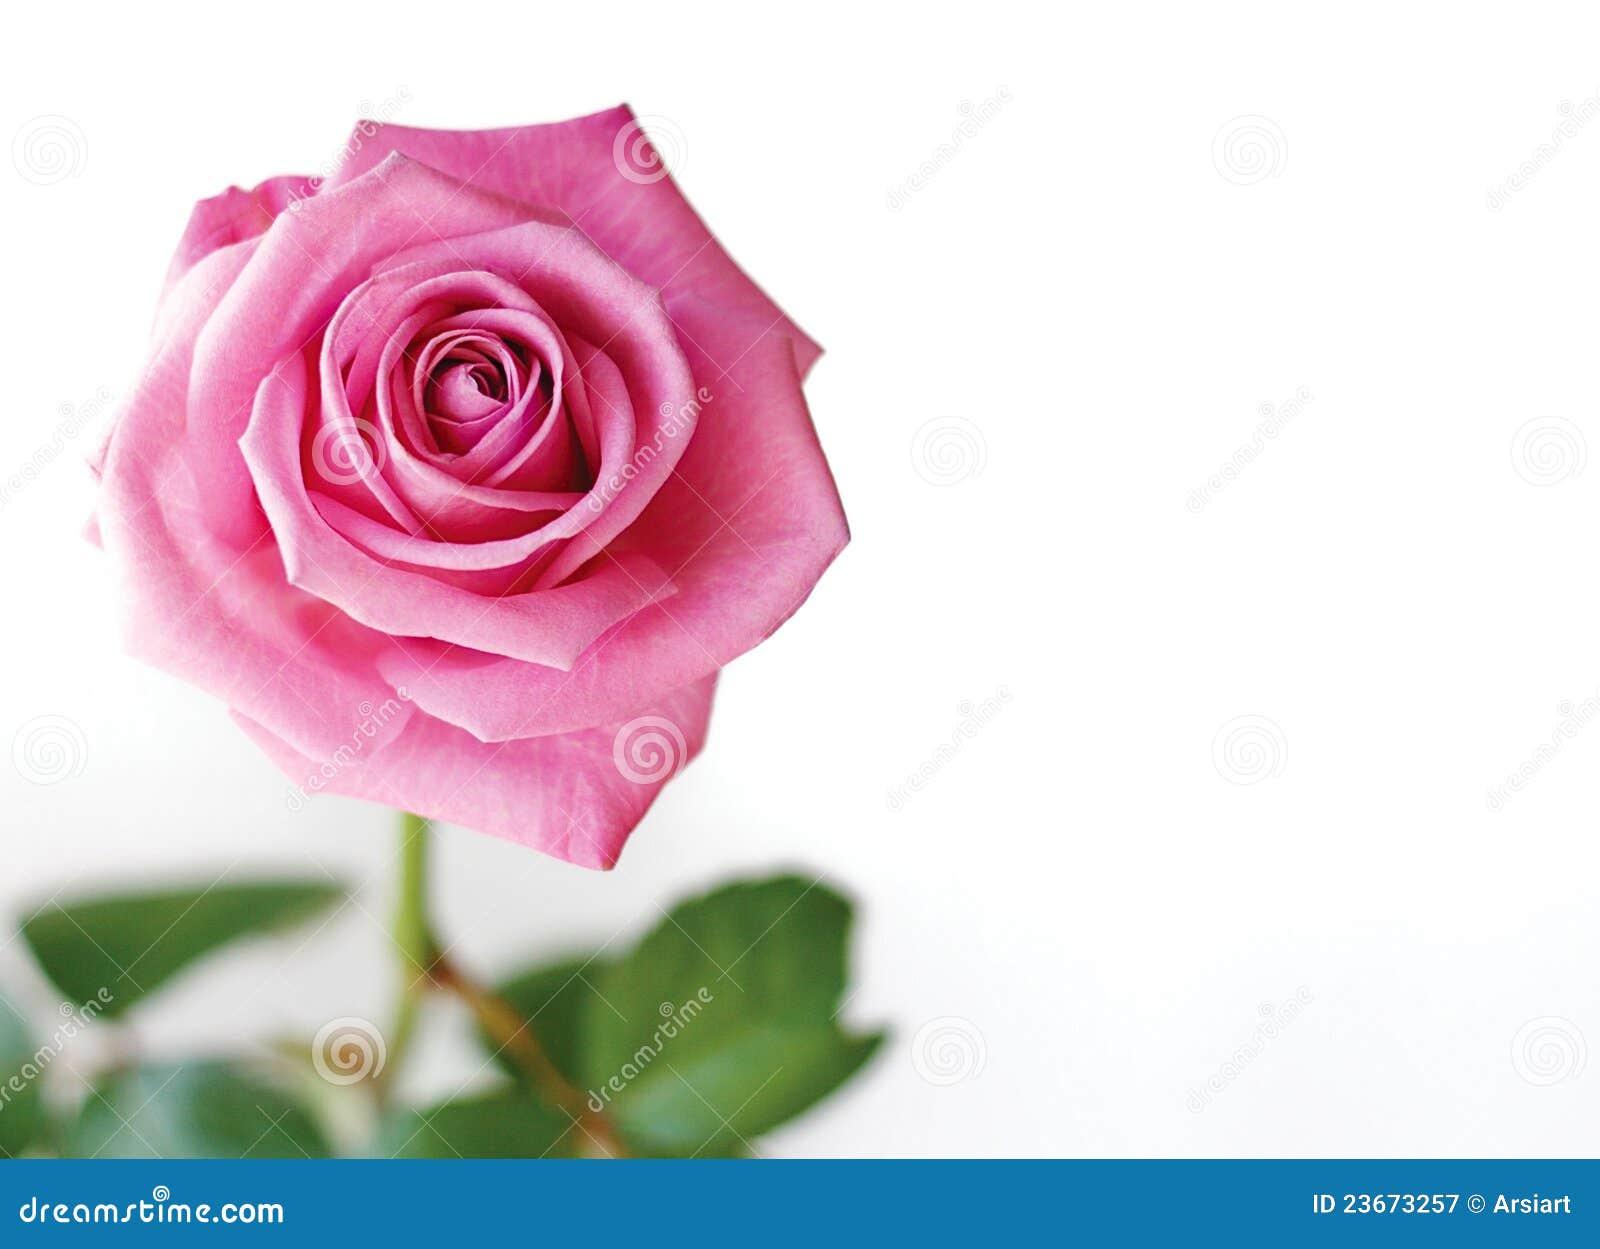 Beautiful Pink Roses Images Beautiful Pink Rose